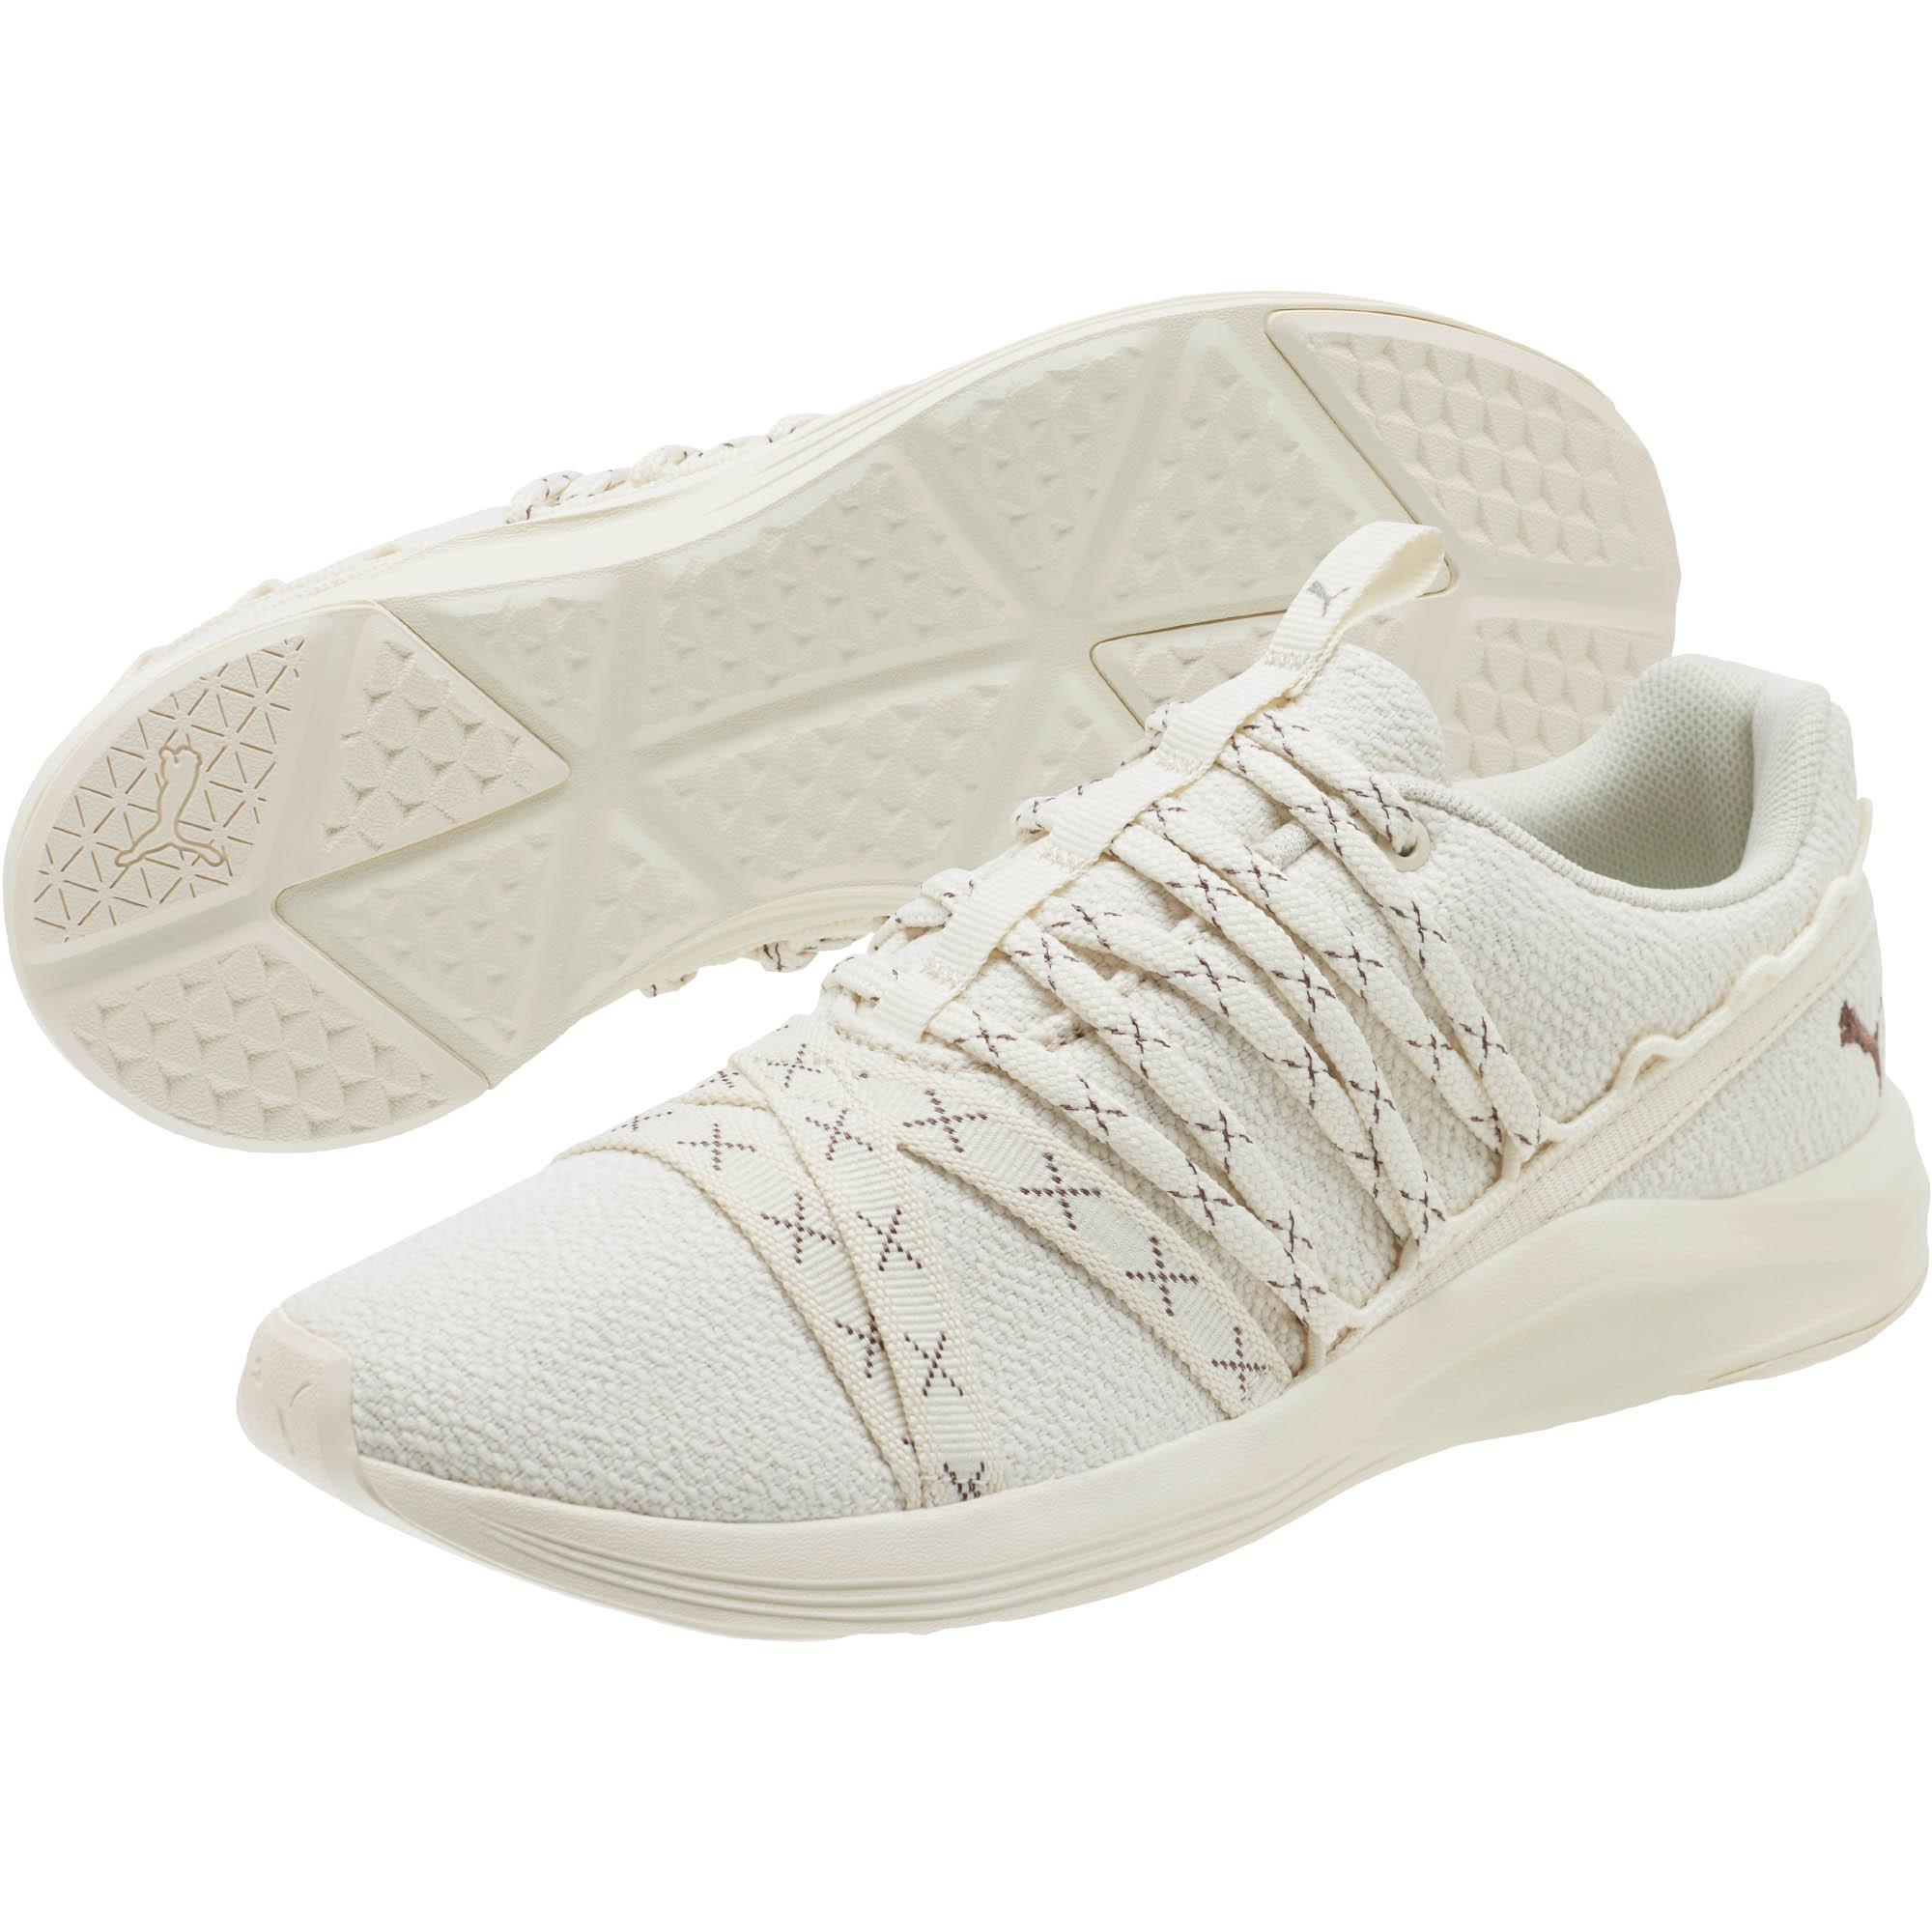 PUMA - White Prowl Alt 2 Lx Women s Sneakers - Lyst. View fullscreen 1a9362a61